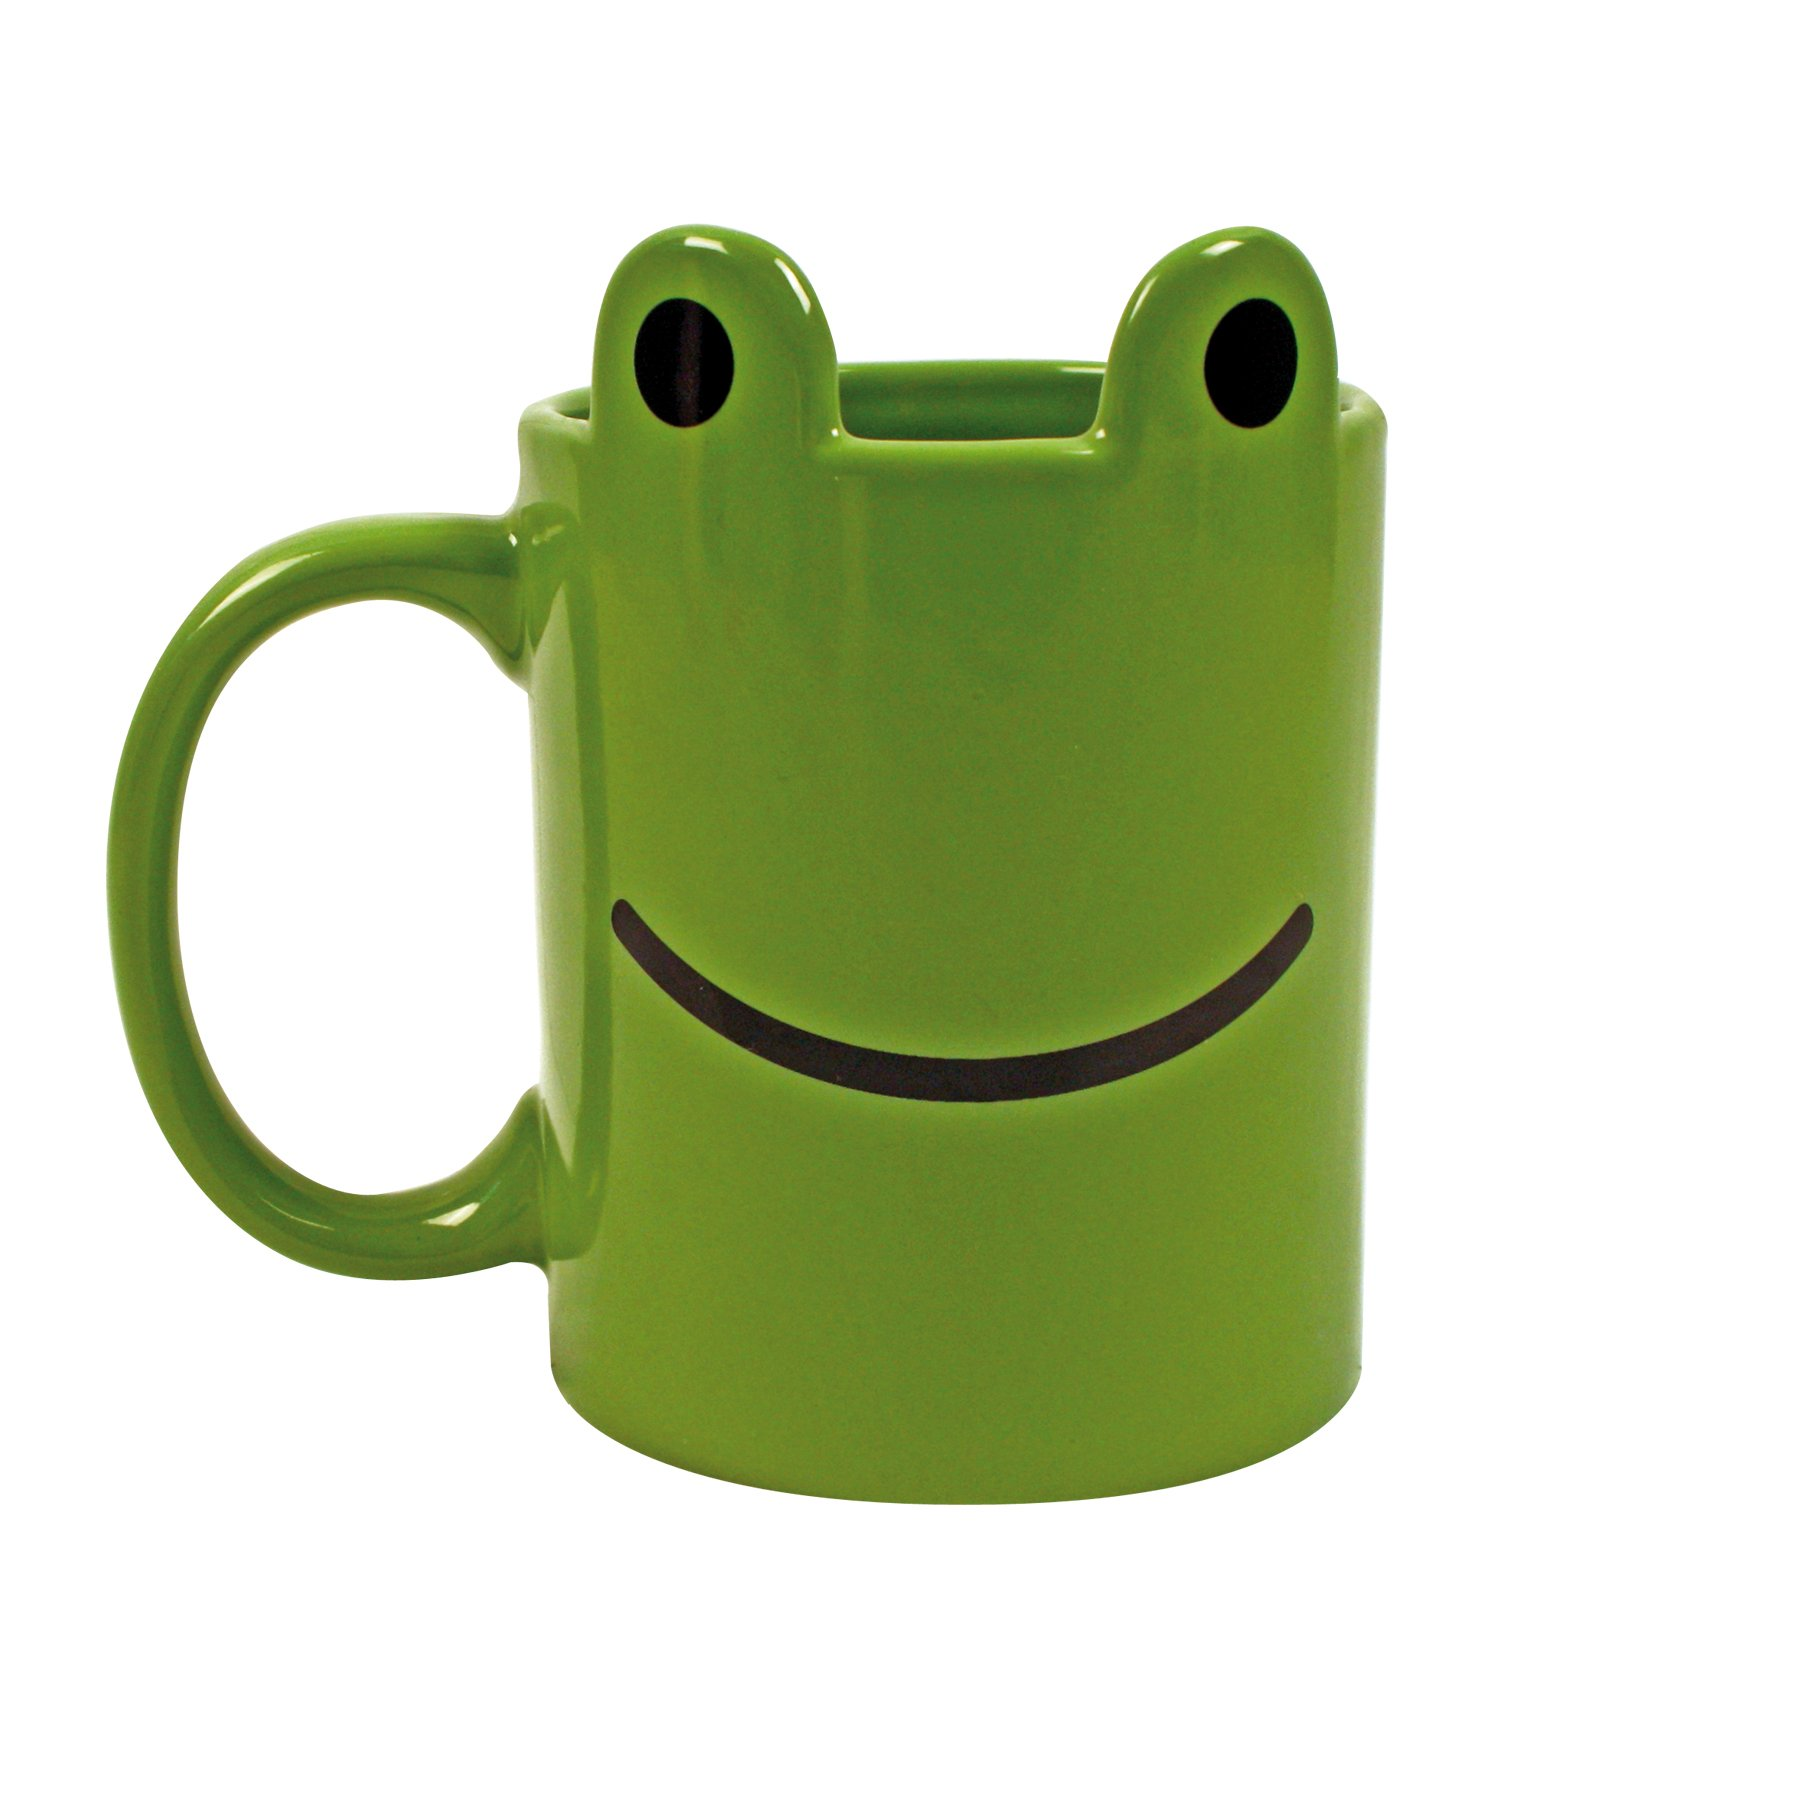 Gift Republic GR400012 Animal Frog Mug, Multicolor